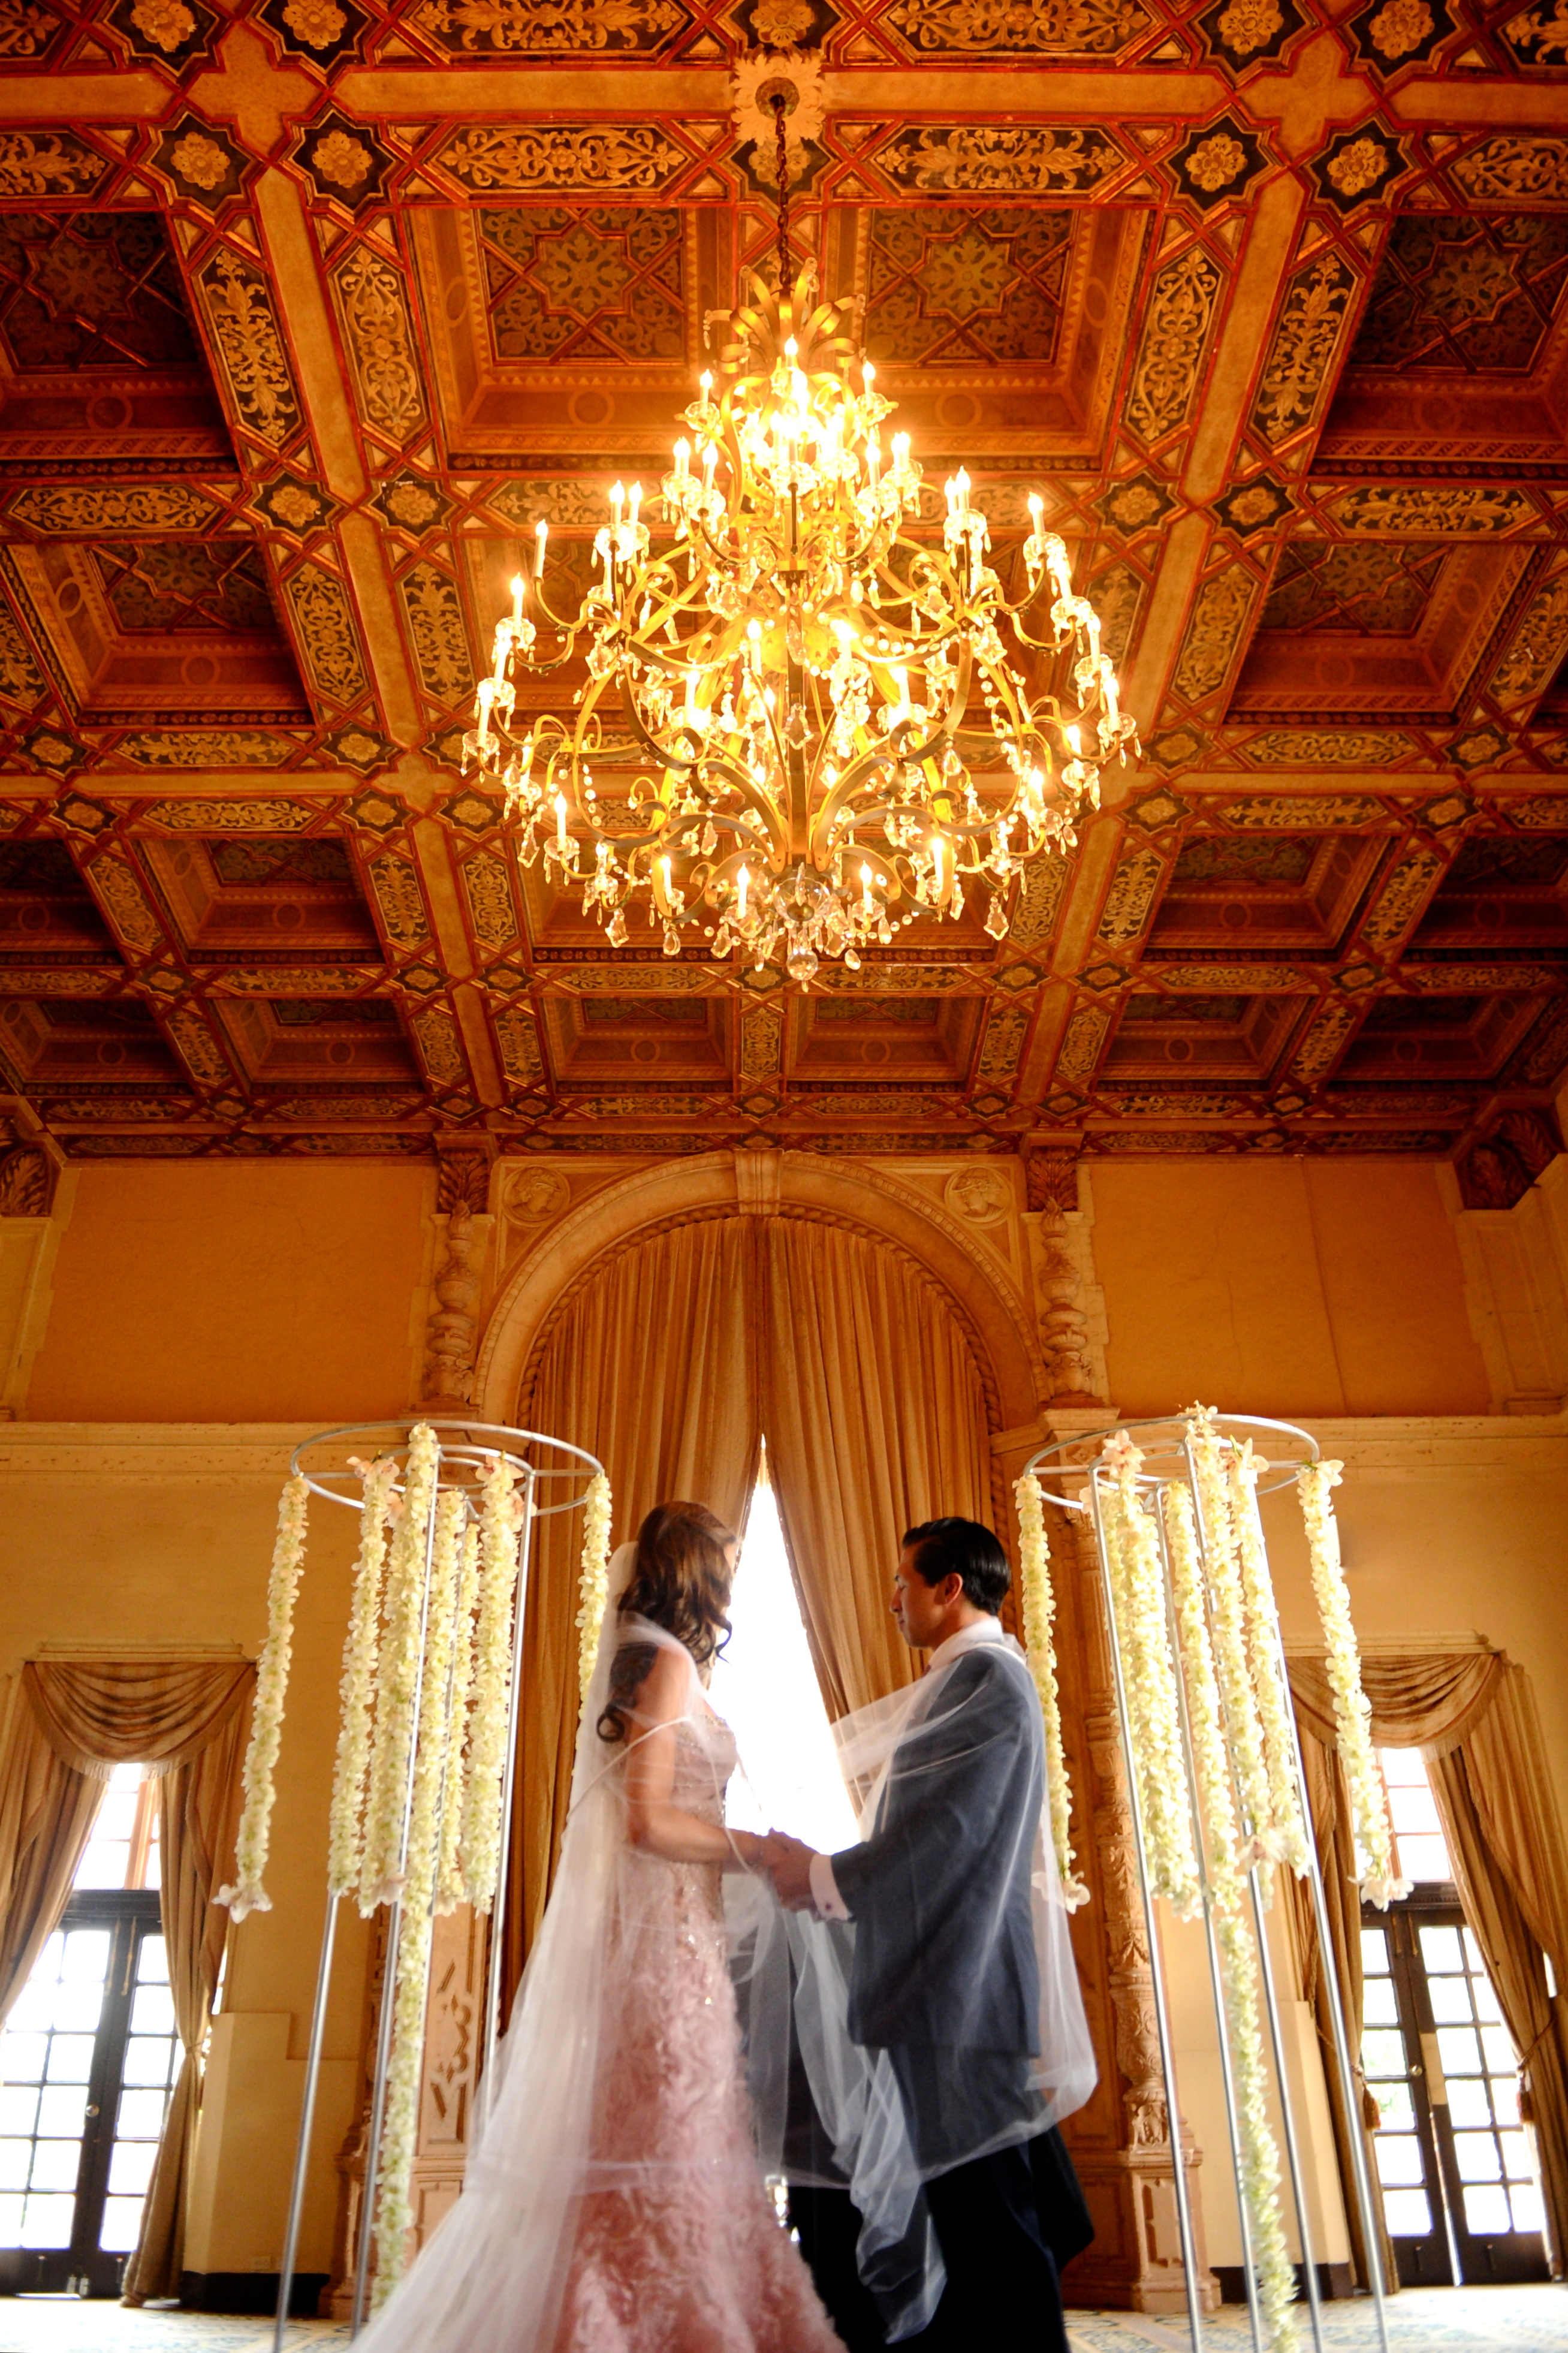 Ceremony, Flowers & Decor, Wedding Dresses, Veils, Fashion, pink, dress, Veil, Wedding, Vows, Persephone eddie